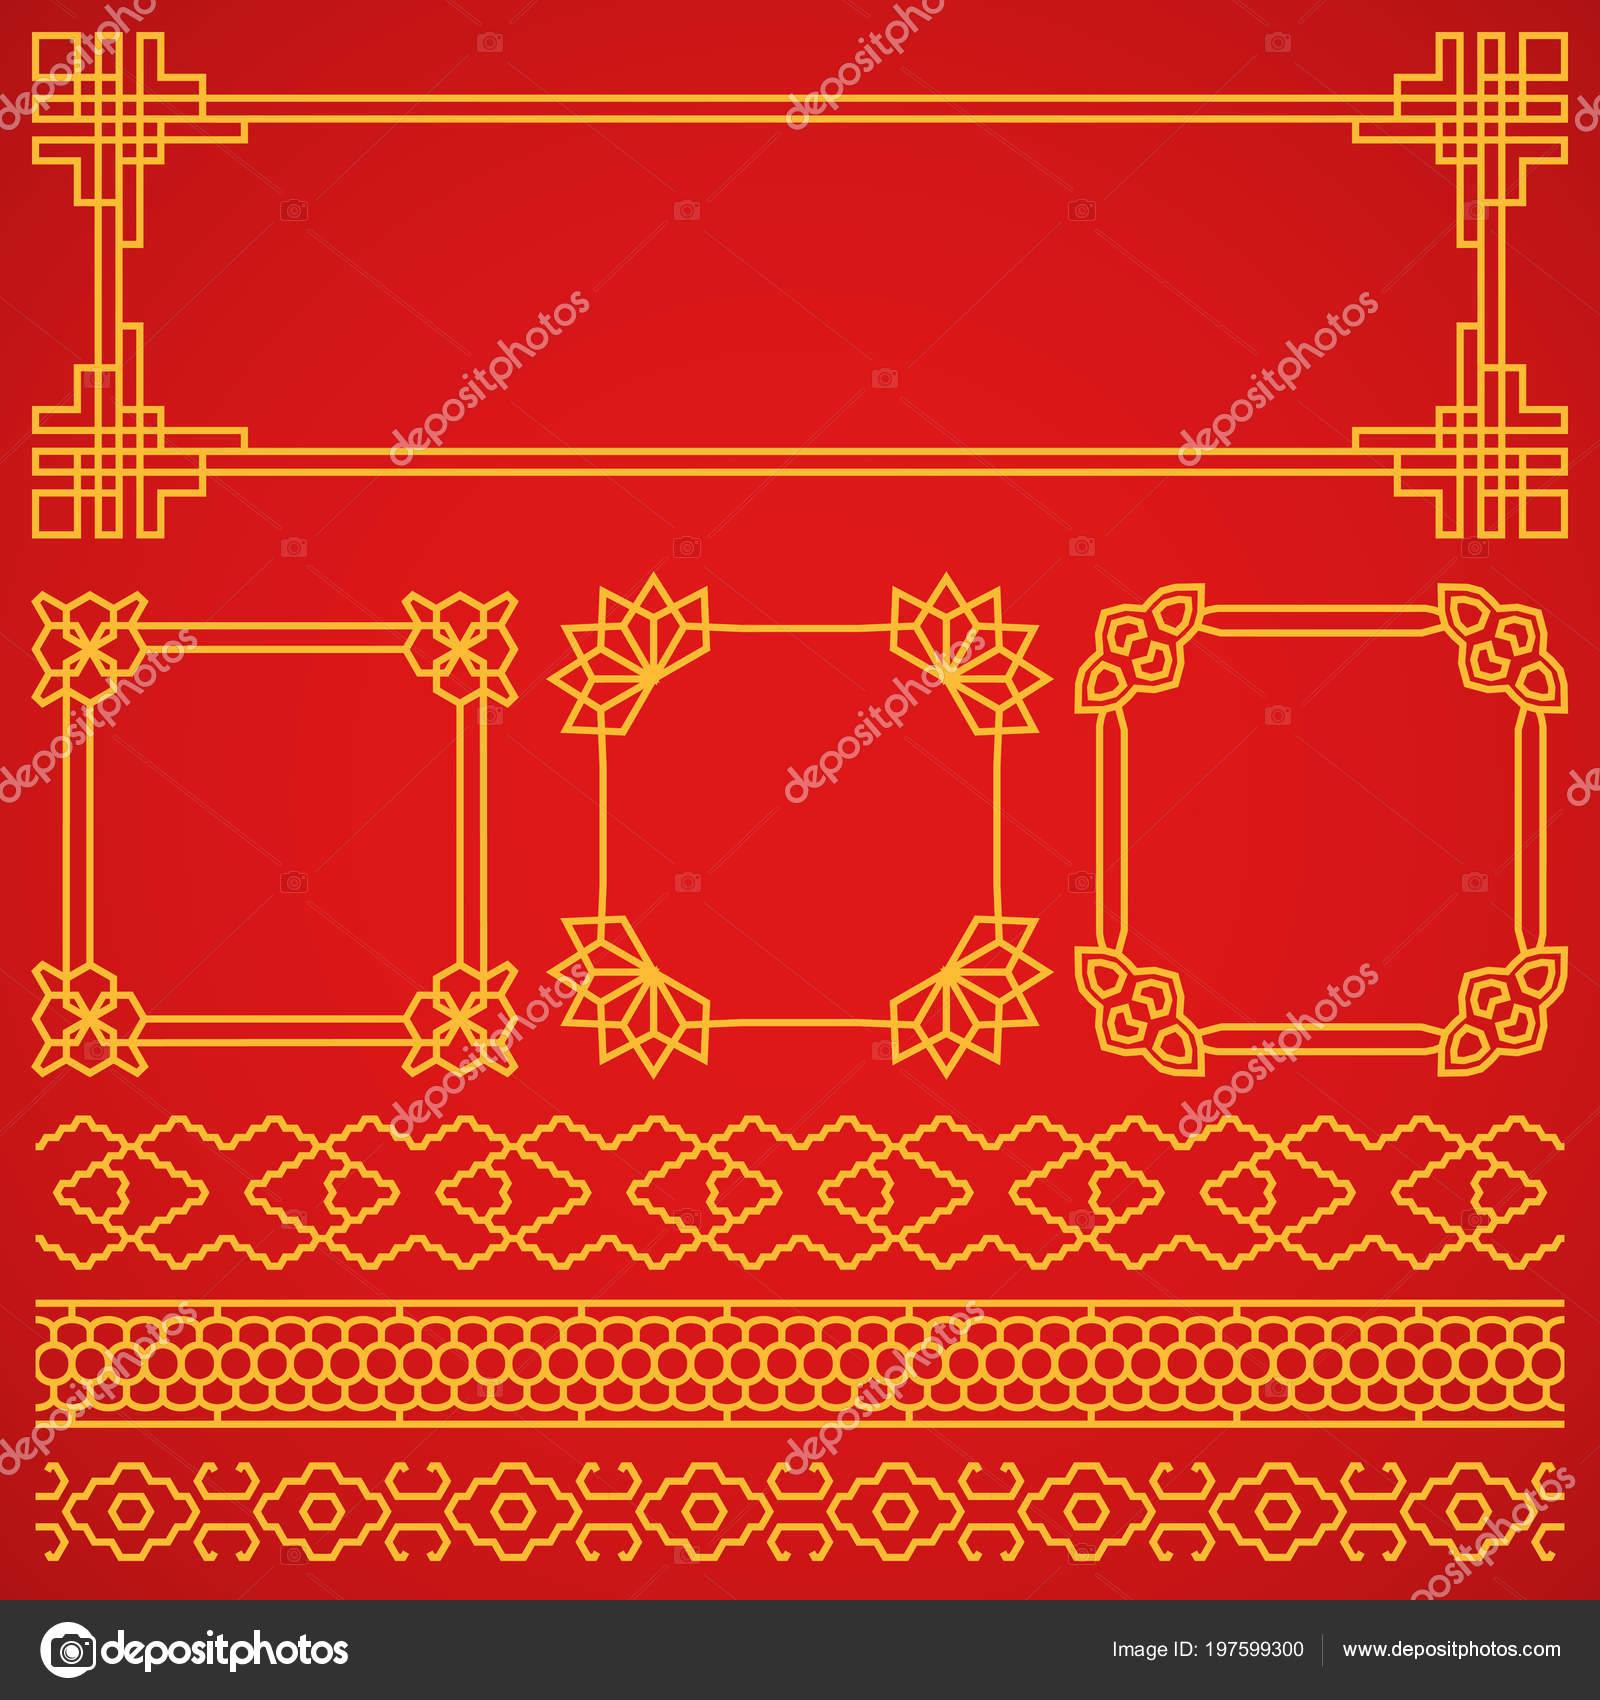 Vector Asian, Korean, Chinese, Japanese Retro Frames, Borders Set Decoration